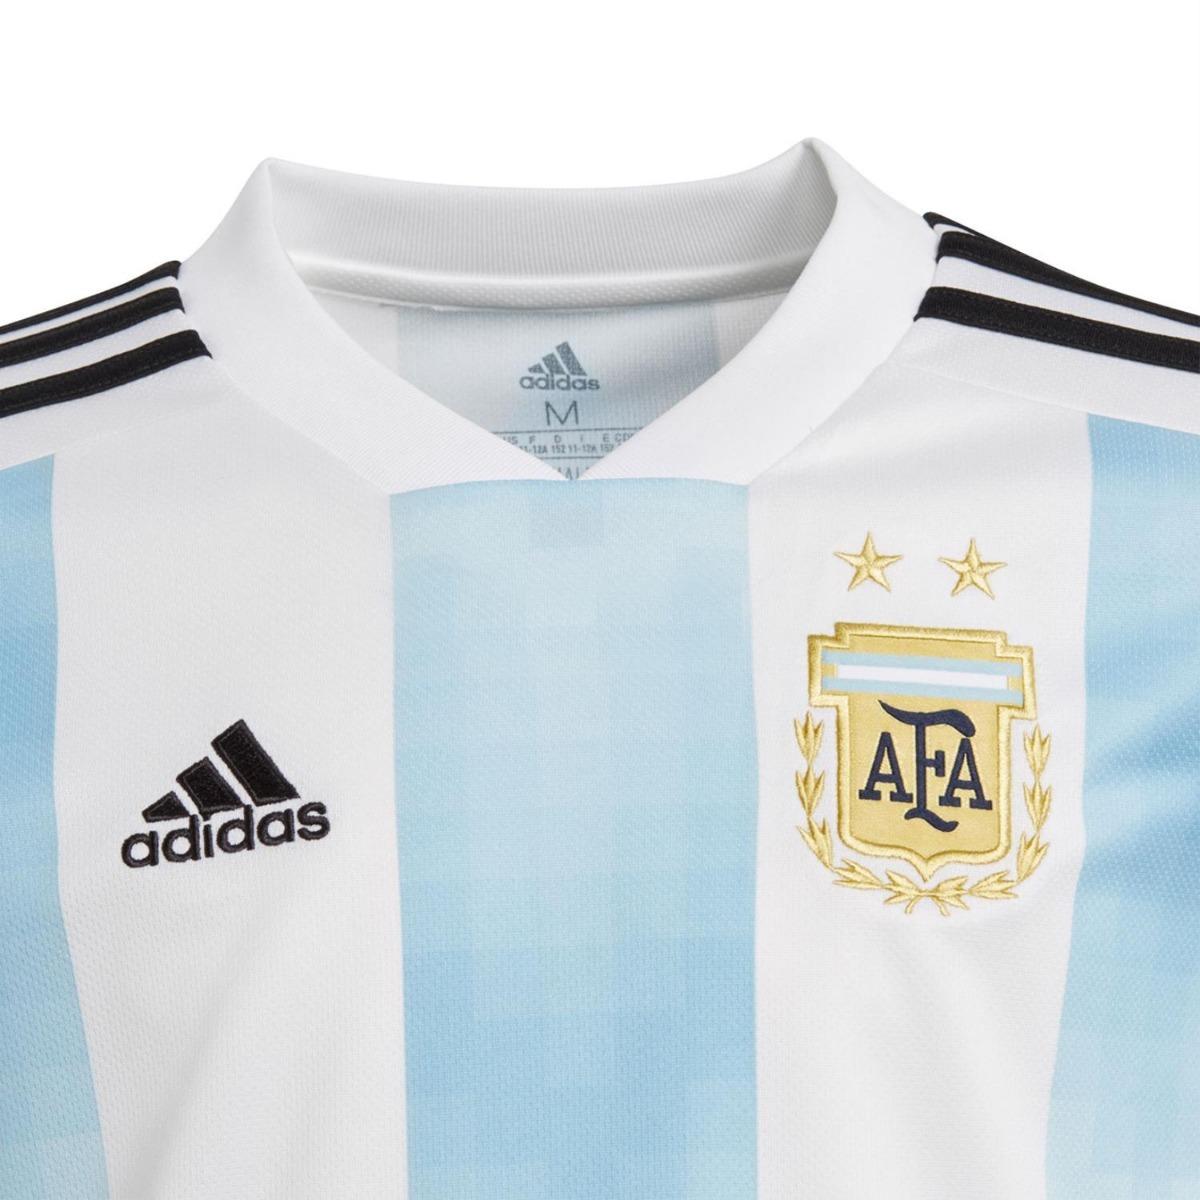 952af8e48 camiseta adidas seleccion argentina oficial 2018 niño. Cargando zoom.